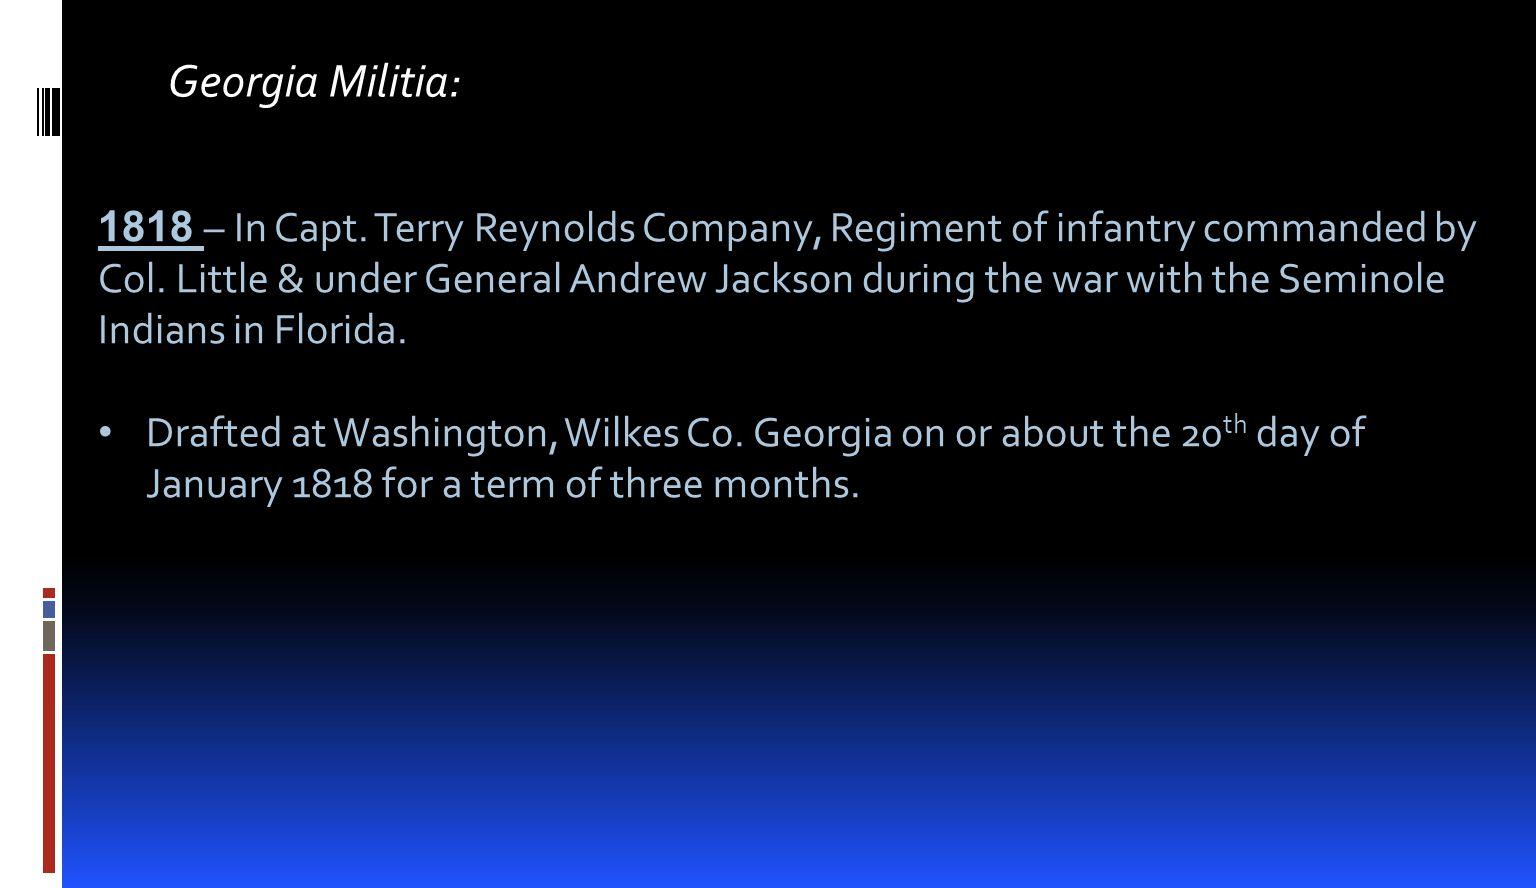 Georgia Militia: